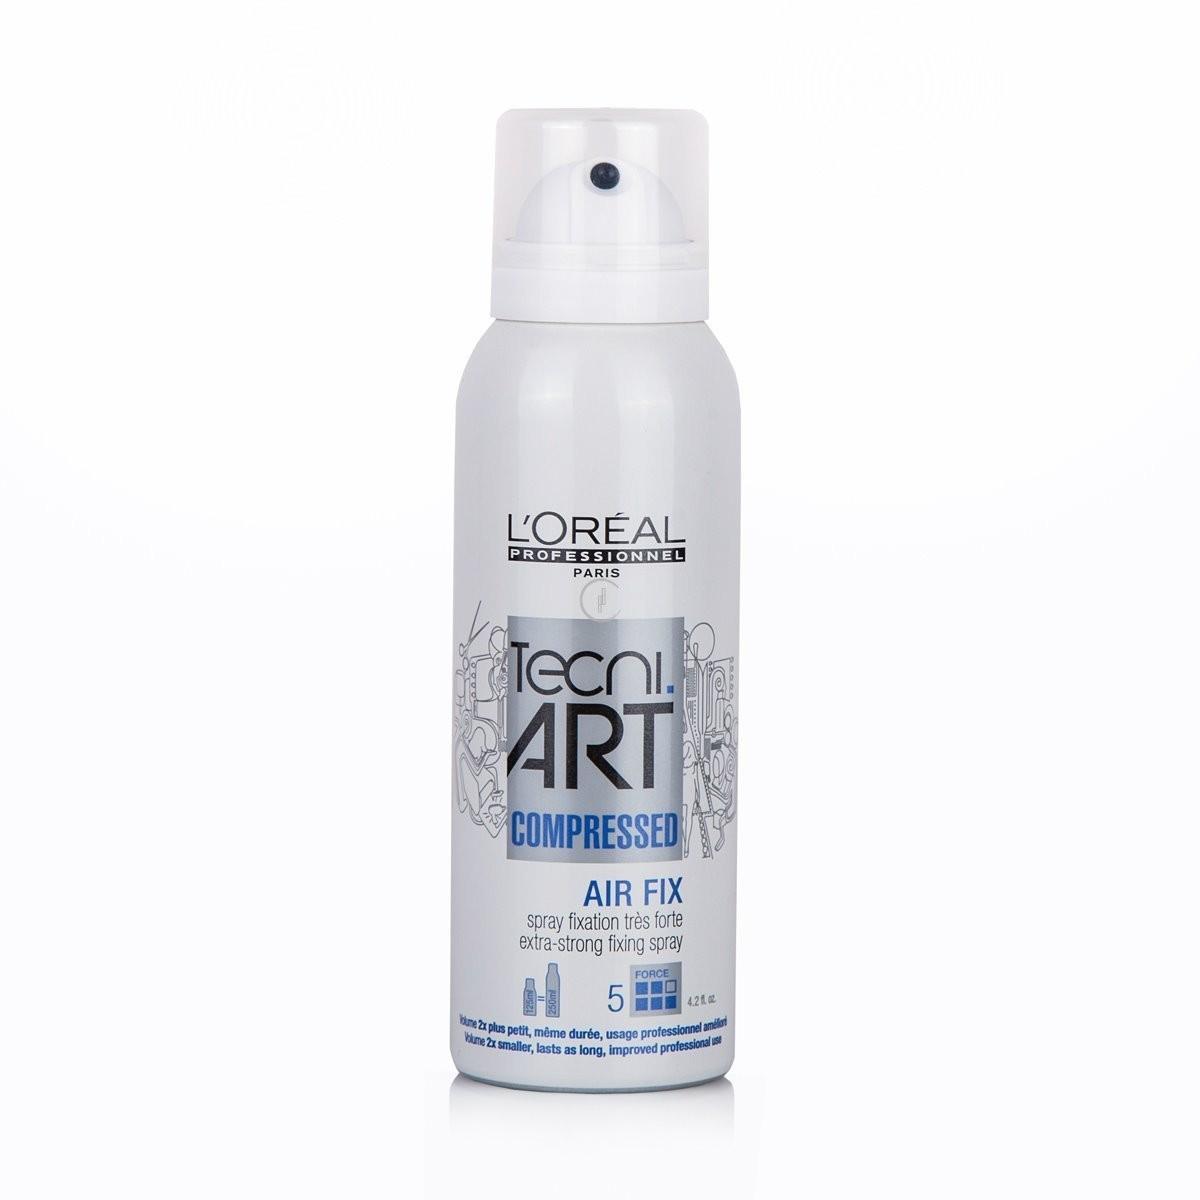 L'OREAL TECNI ART AIR FIX SPRAY COMPRESSED 125ml